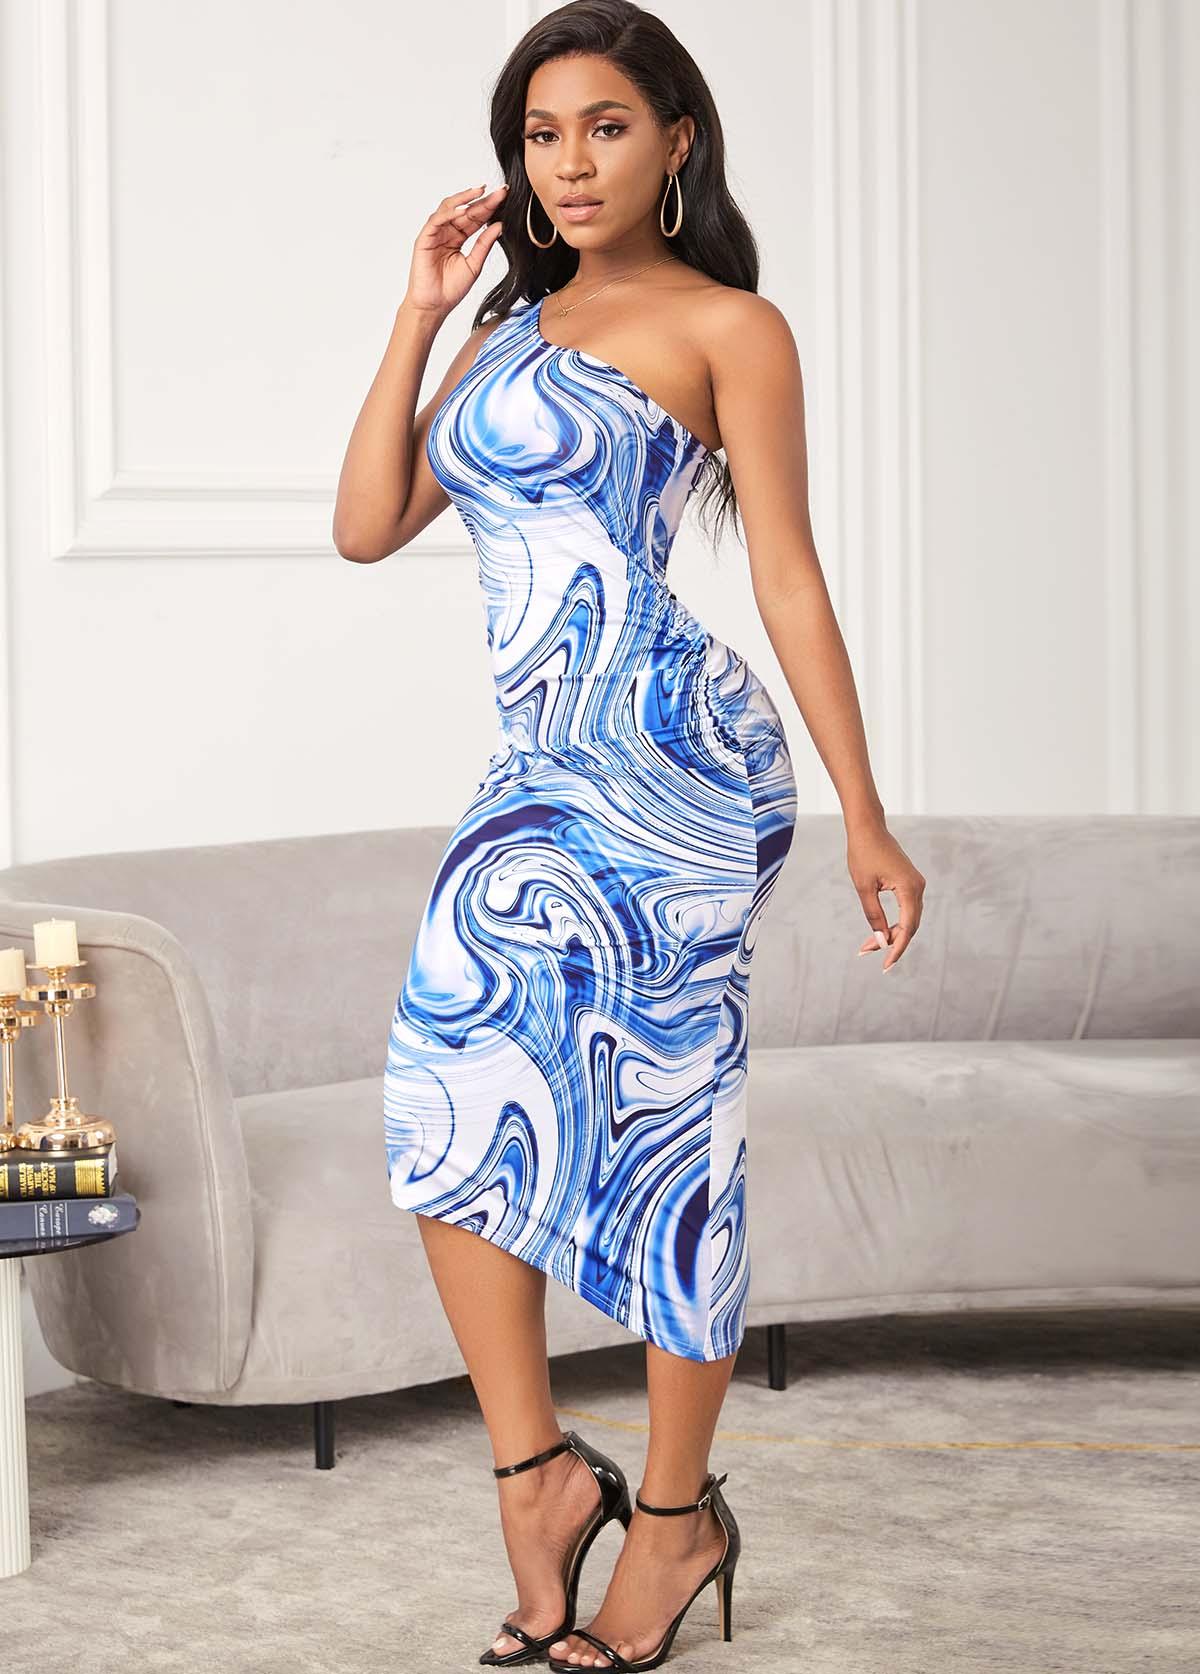 ROTITA Printed One Shoulder Skew Neck Bodycon Dress